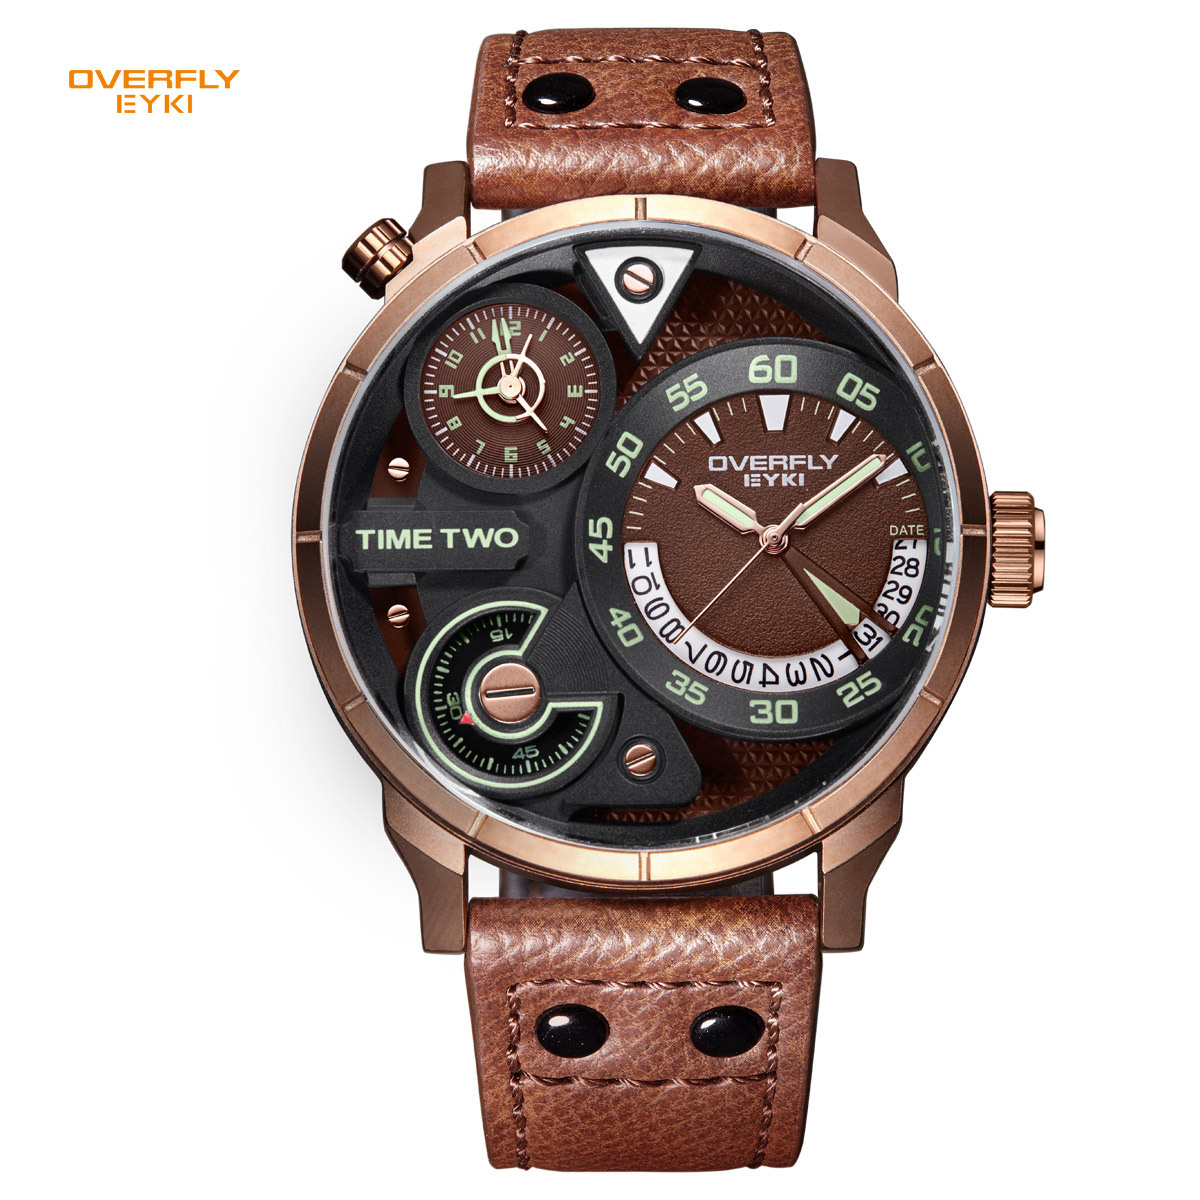 EYKI Brand Men Watches Big Dial Two Time Zone Display Sports Watch Male Genuine Leather Waterproof Clock Relogio Masculino 2018